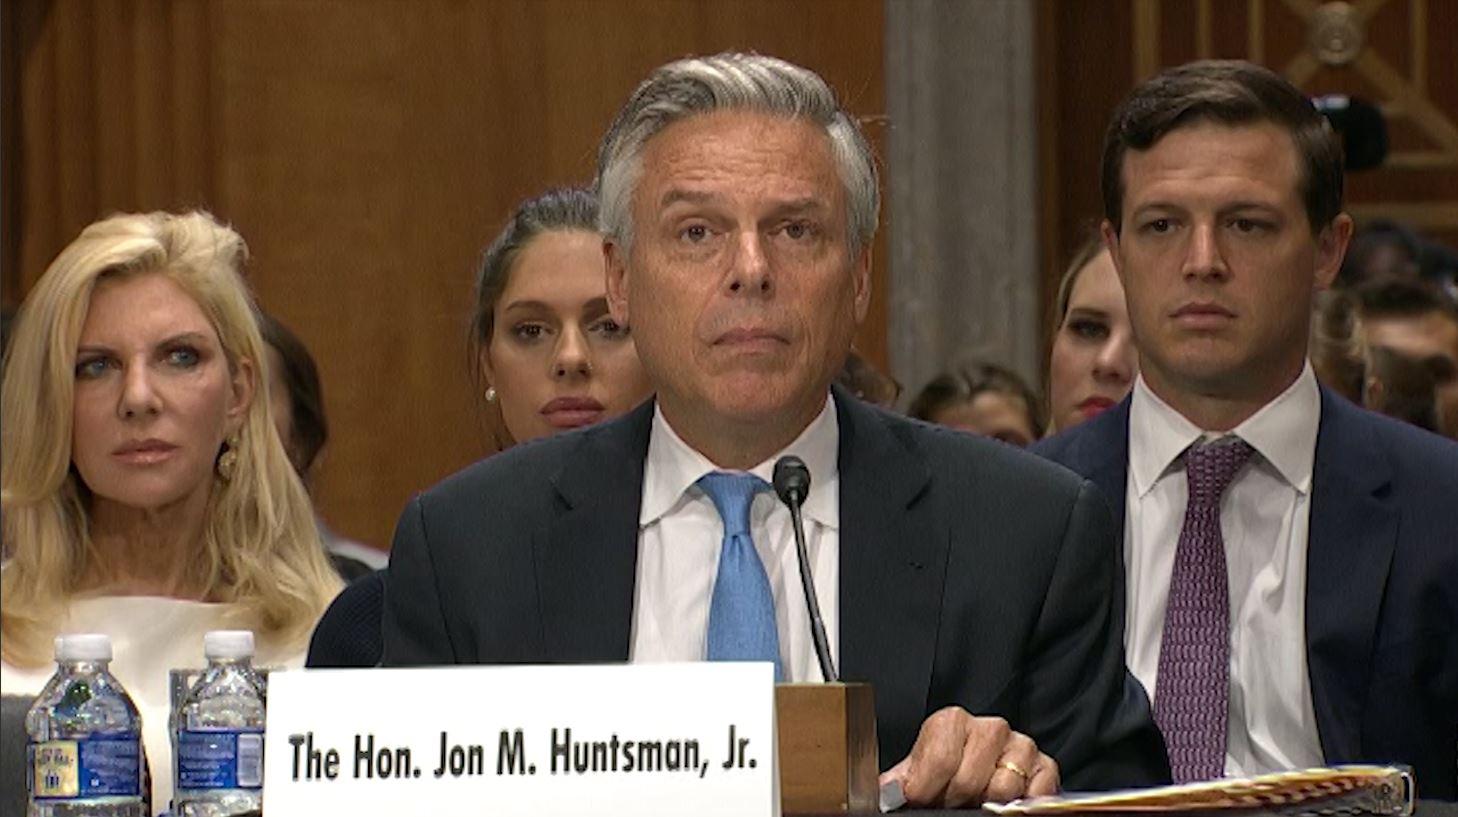 Jon Huntsman Jr.